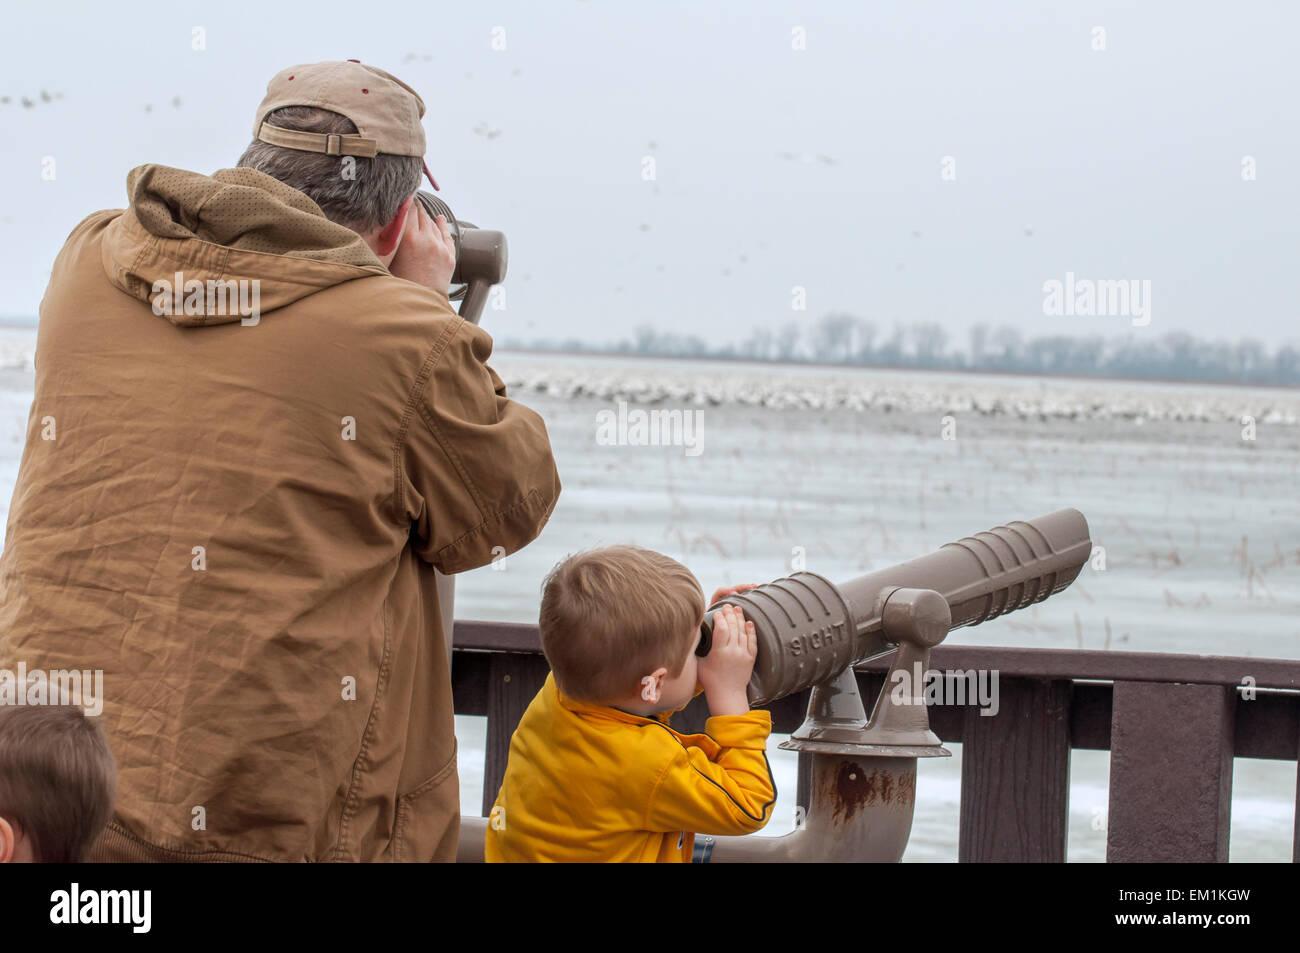 Mann und der junge Ausschau-Teleskop am Vögel Stockbild